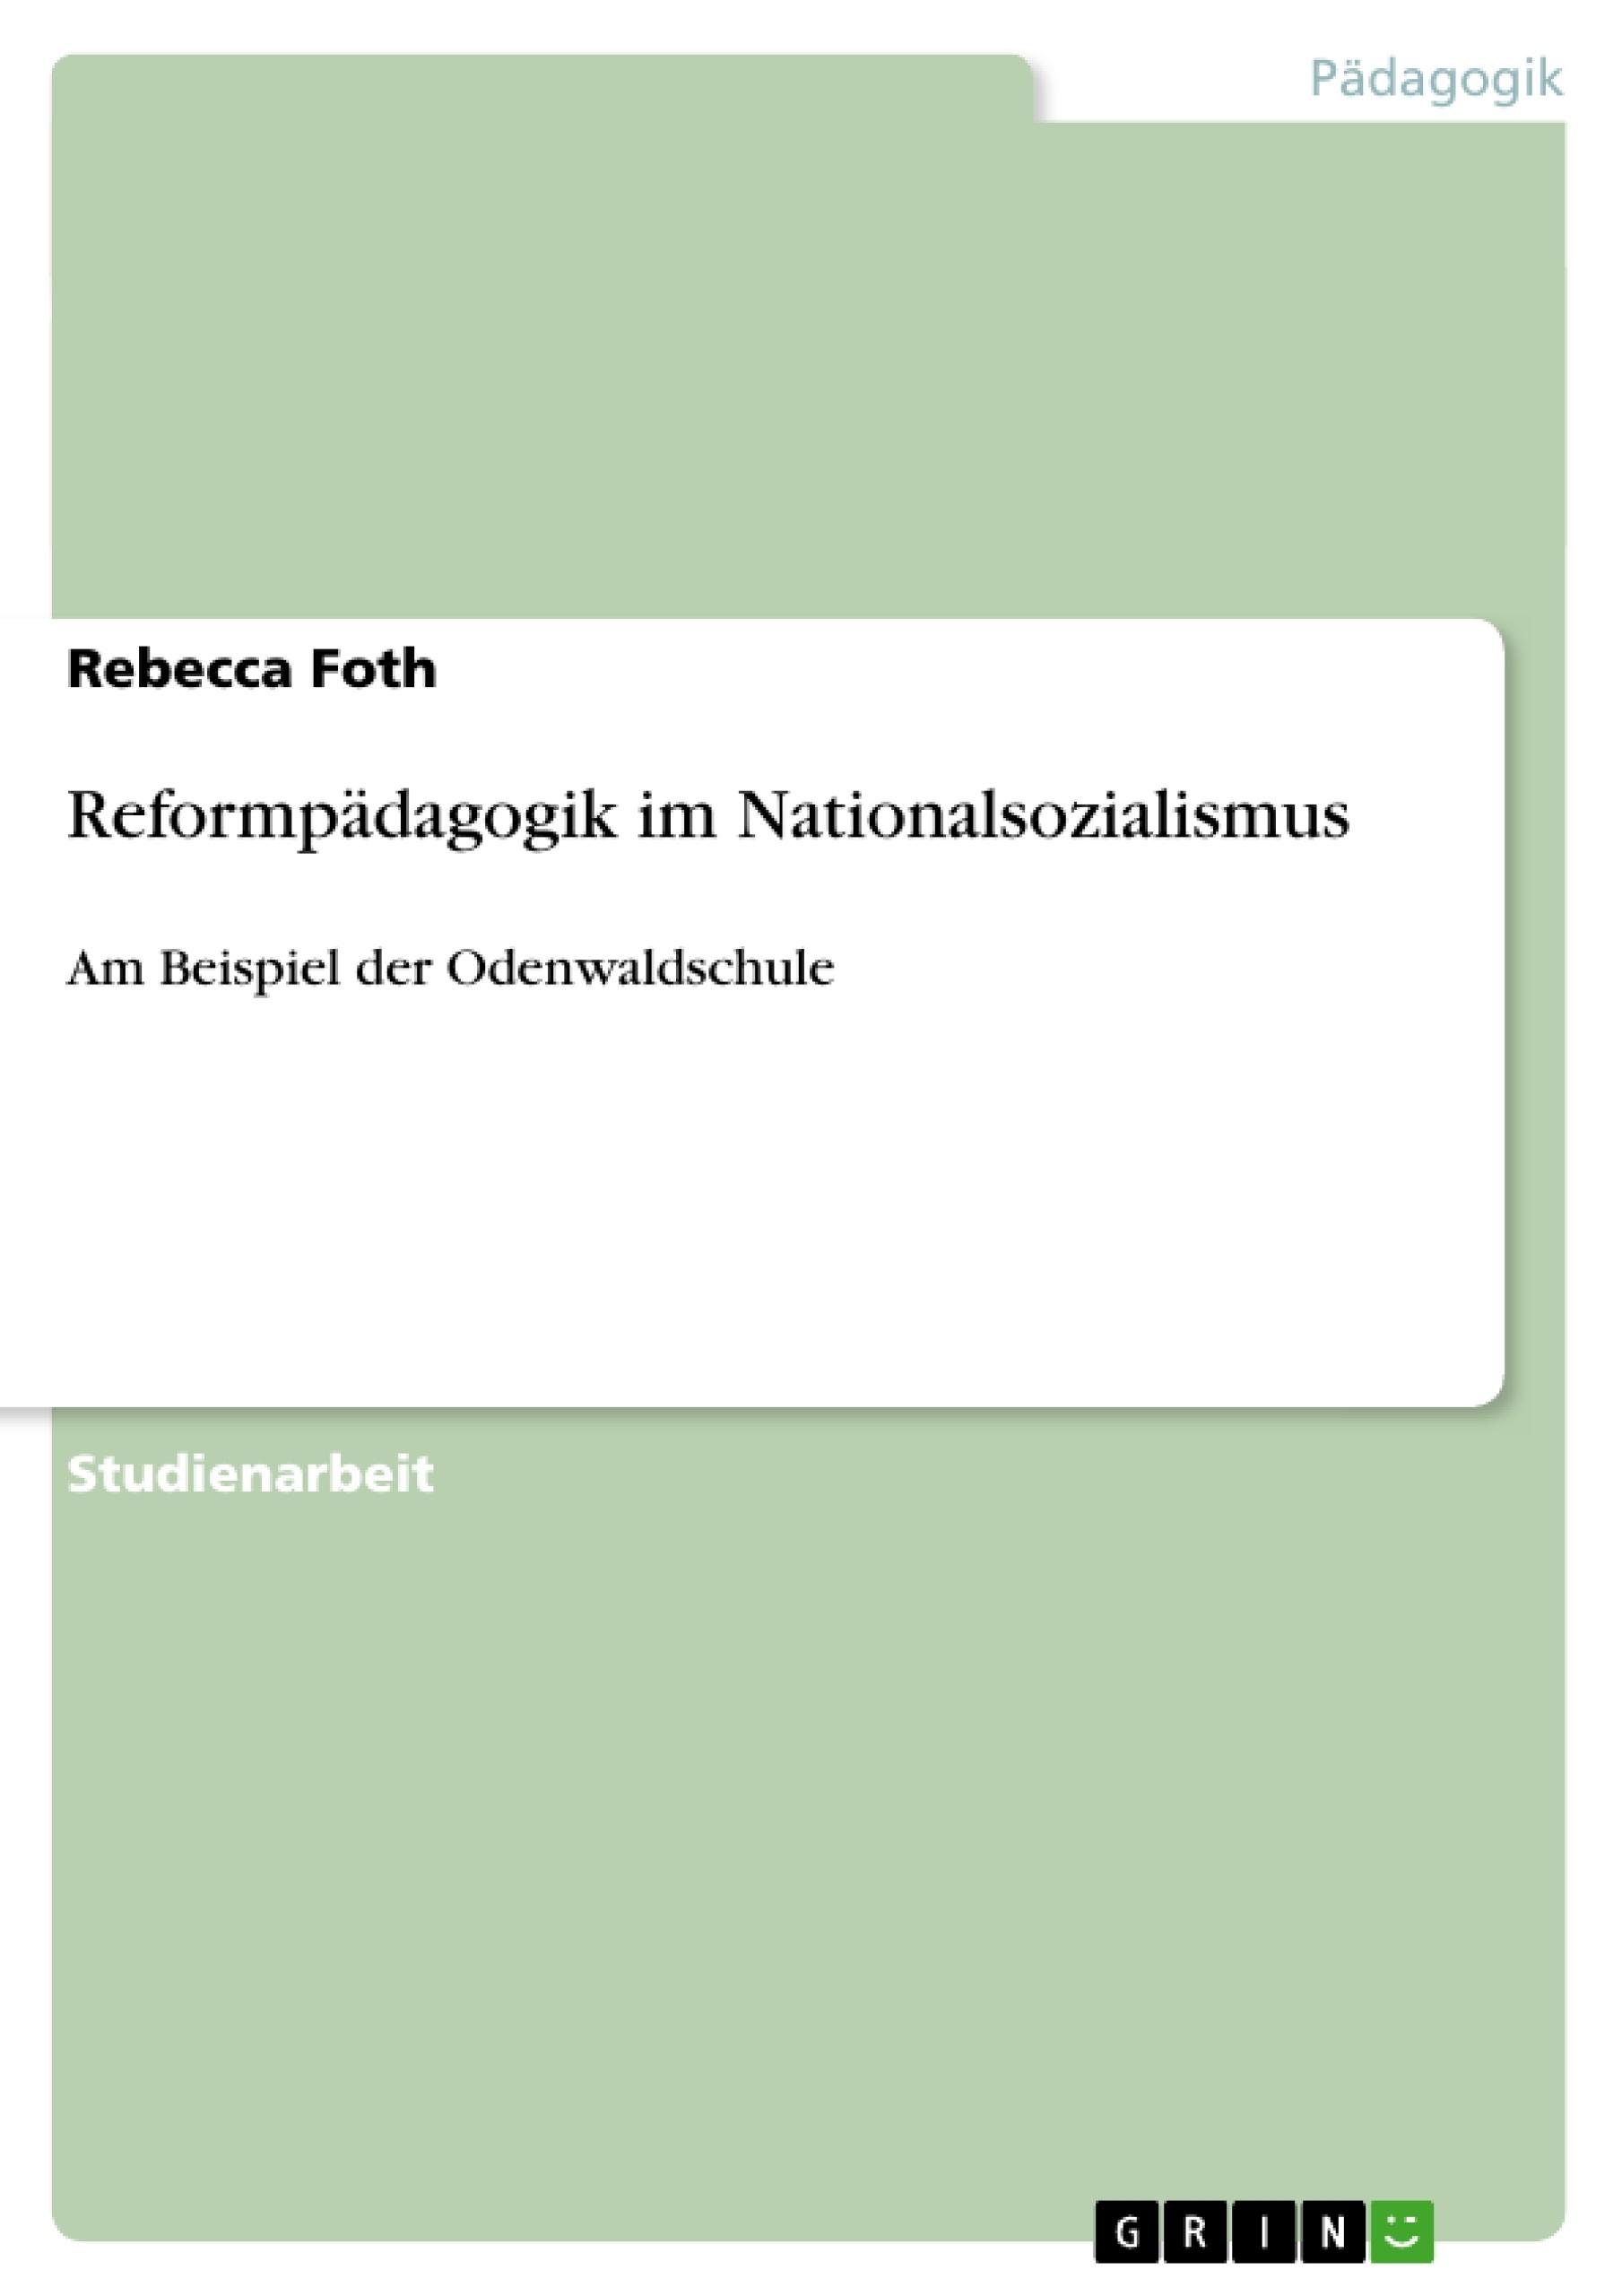 Titel: Reformpädagogik im Nationalsozialismus